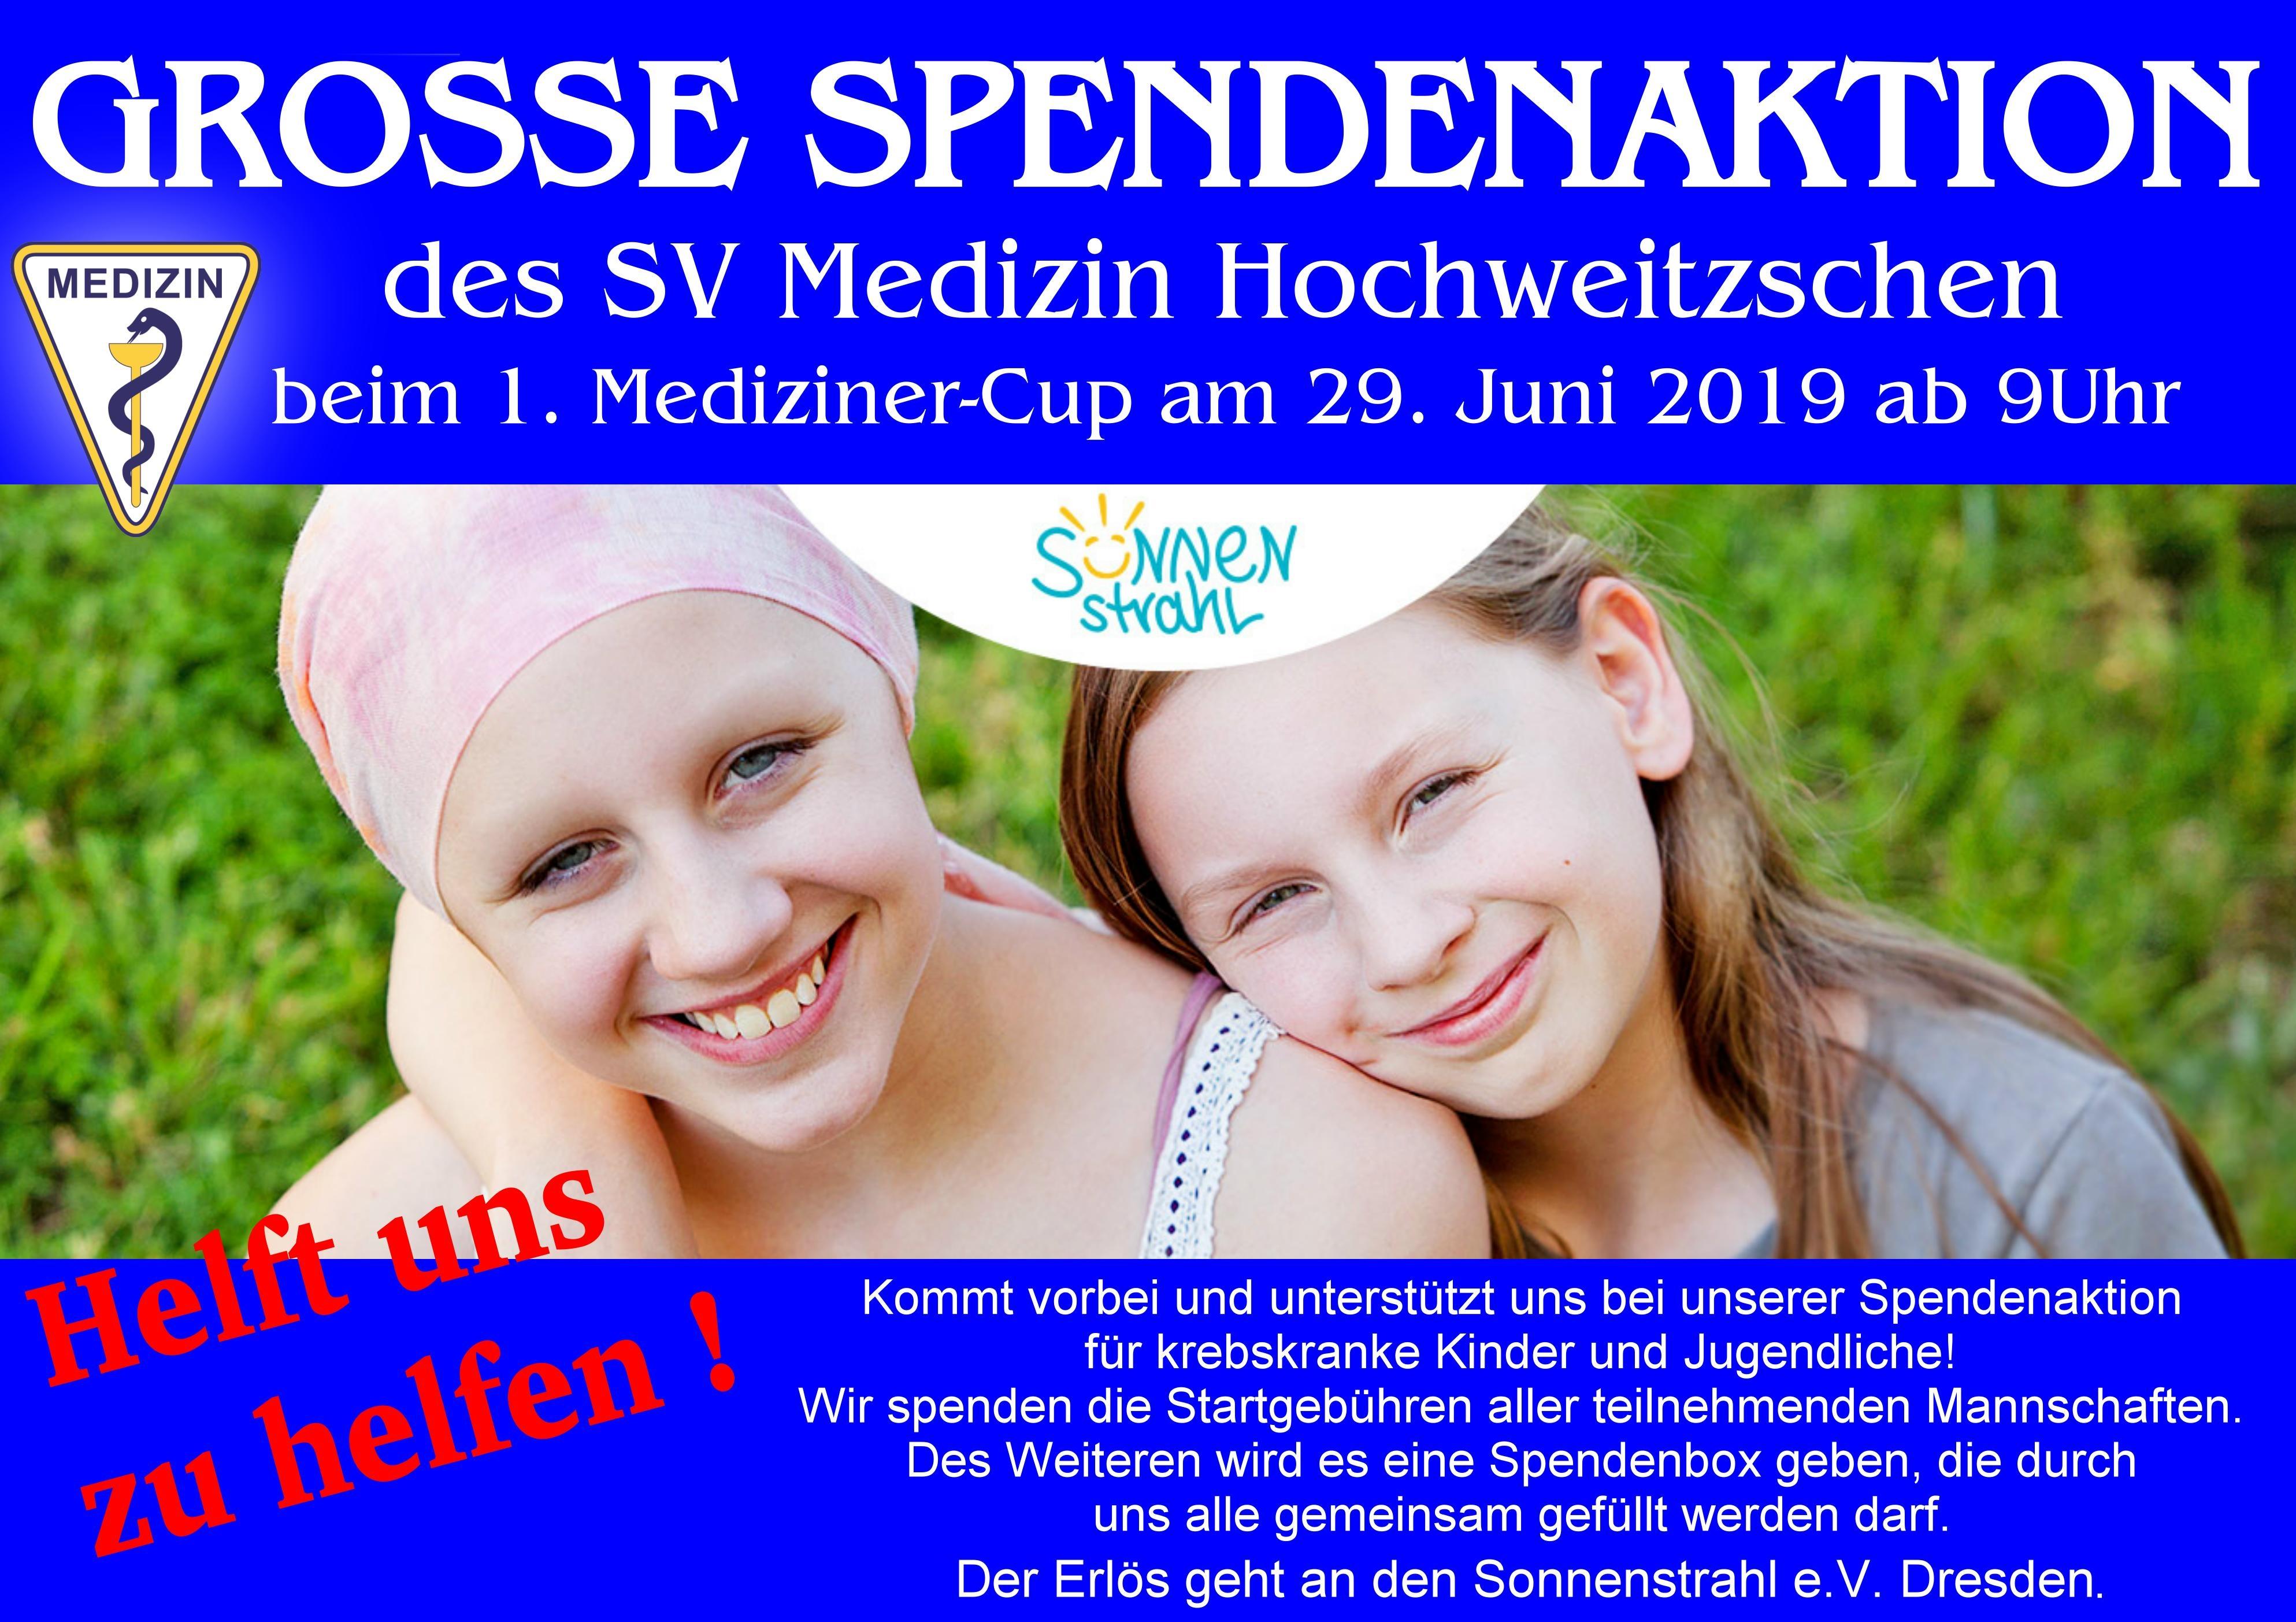 http://www.medizin-hochweitzschen.de/wp-content/uploads/2019/05/Spendenaufruf-2019.jpg